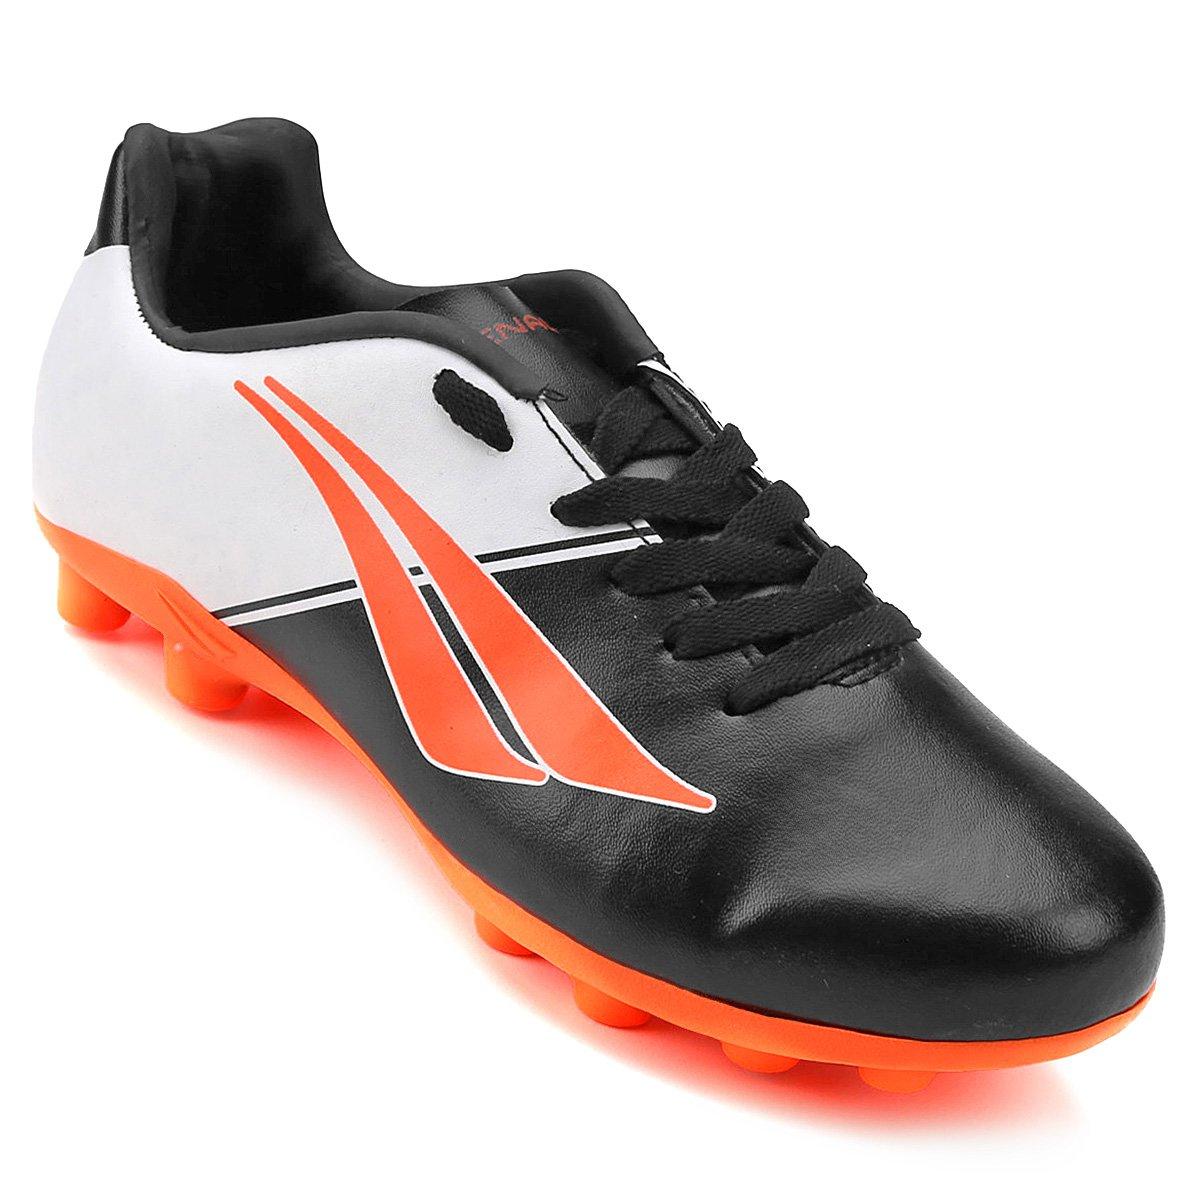 d9bc9d0c2bbf6 Chuteira Campo Infantil Penalty Matis K Soccer 7 - Preto e Laranja - Compre  Agora